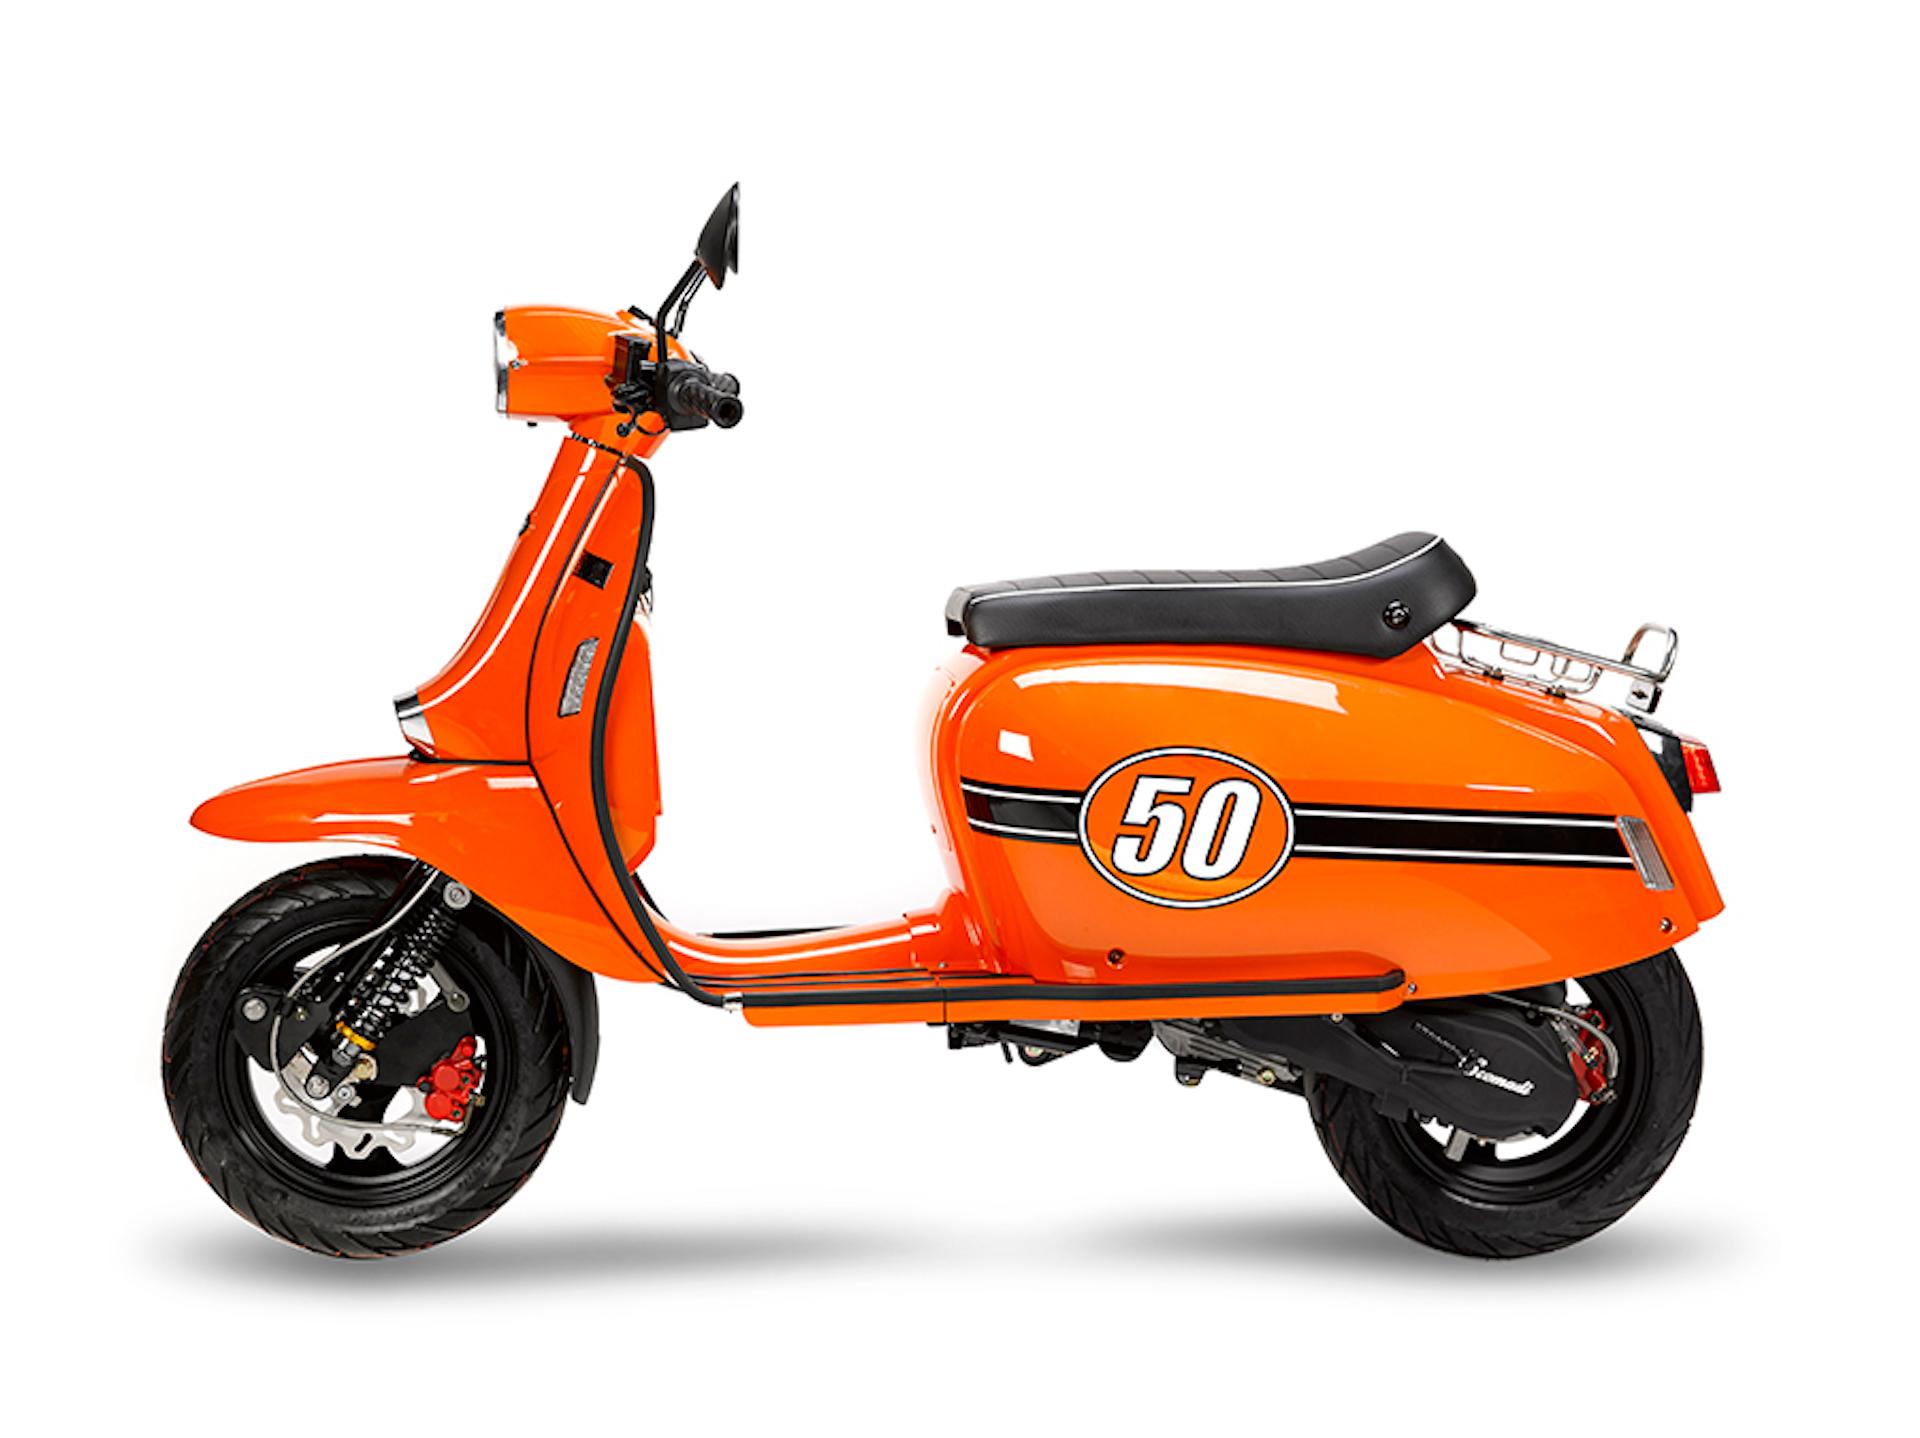 Scomadi Tl Naranja50